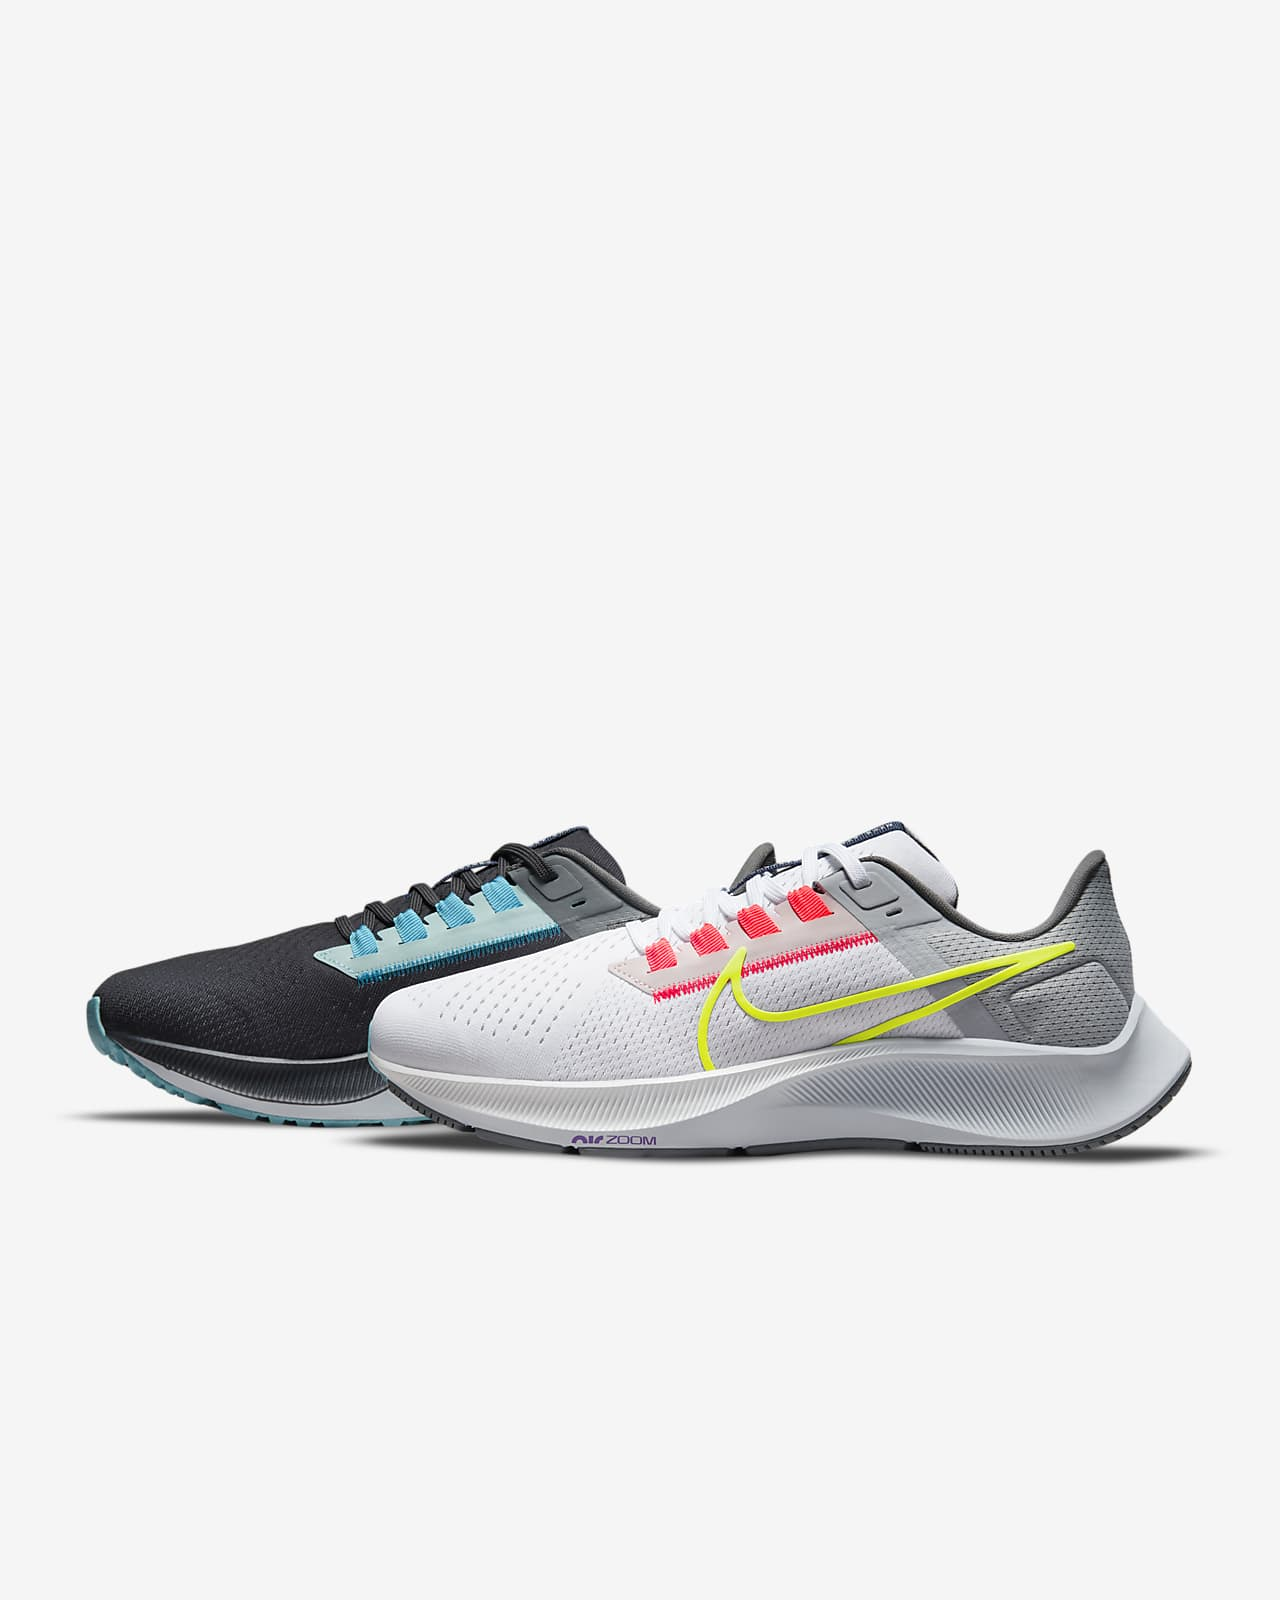 Löparsko Nike Air Zoom Pegasus 38 Limited Edition för kvinnor